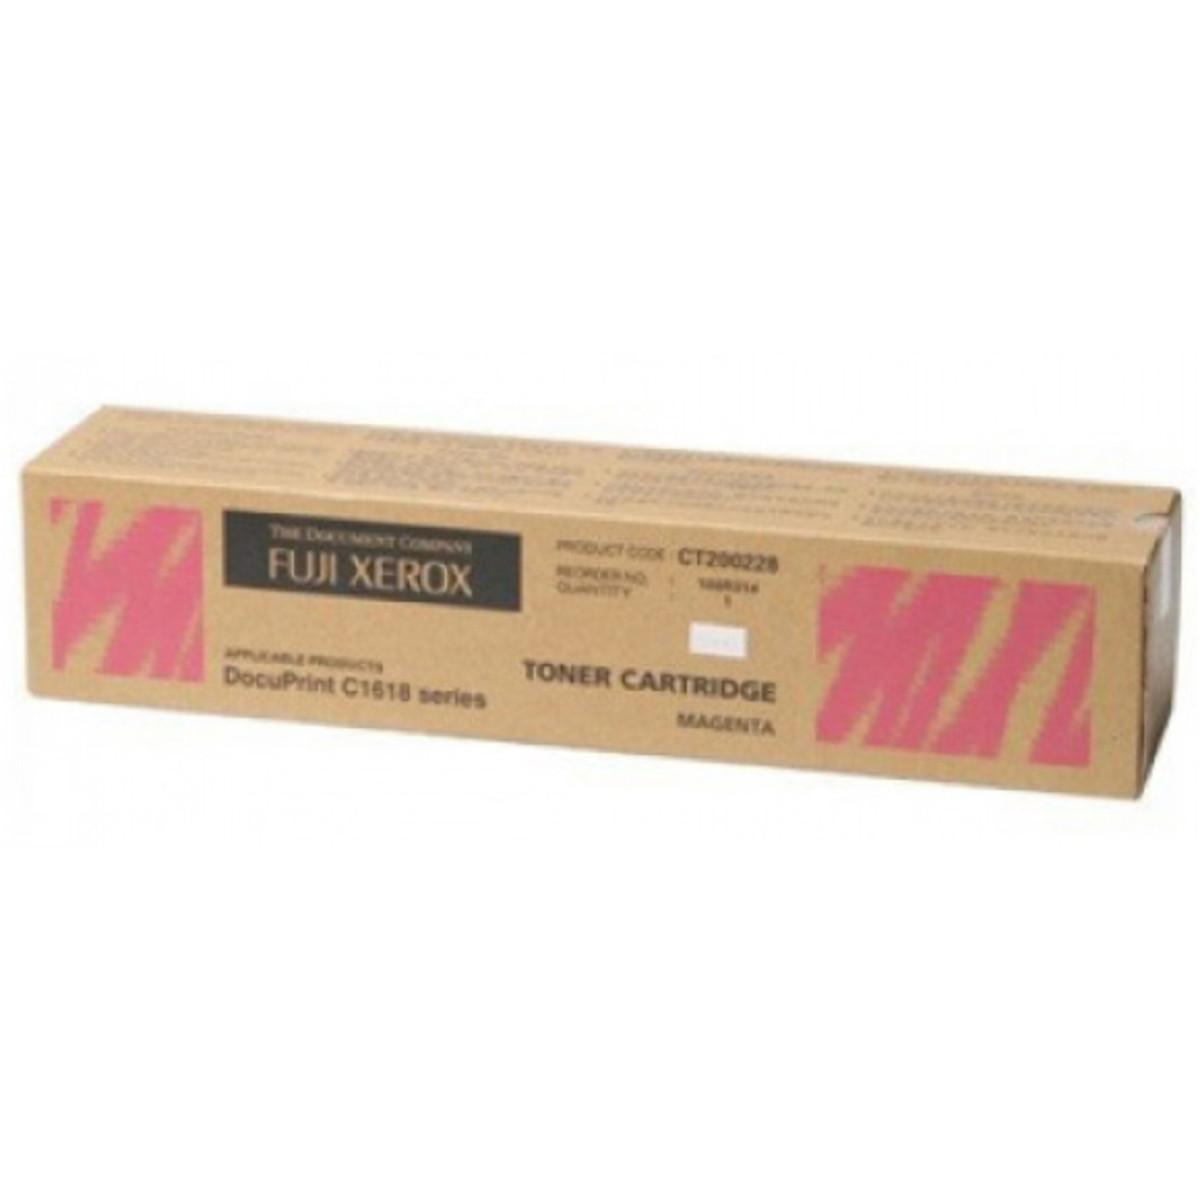 Xerox CT200228 Magenta Toner Cartridge